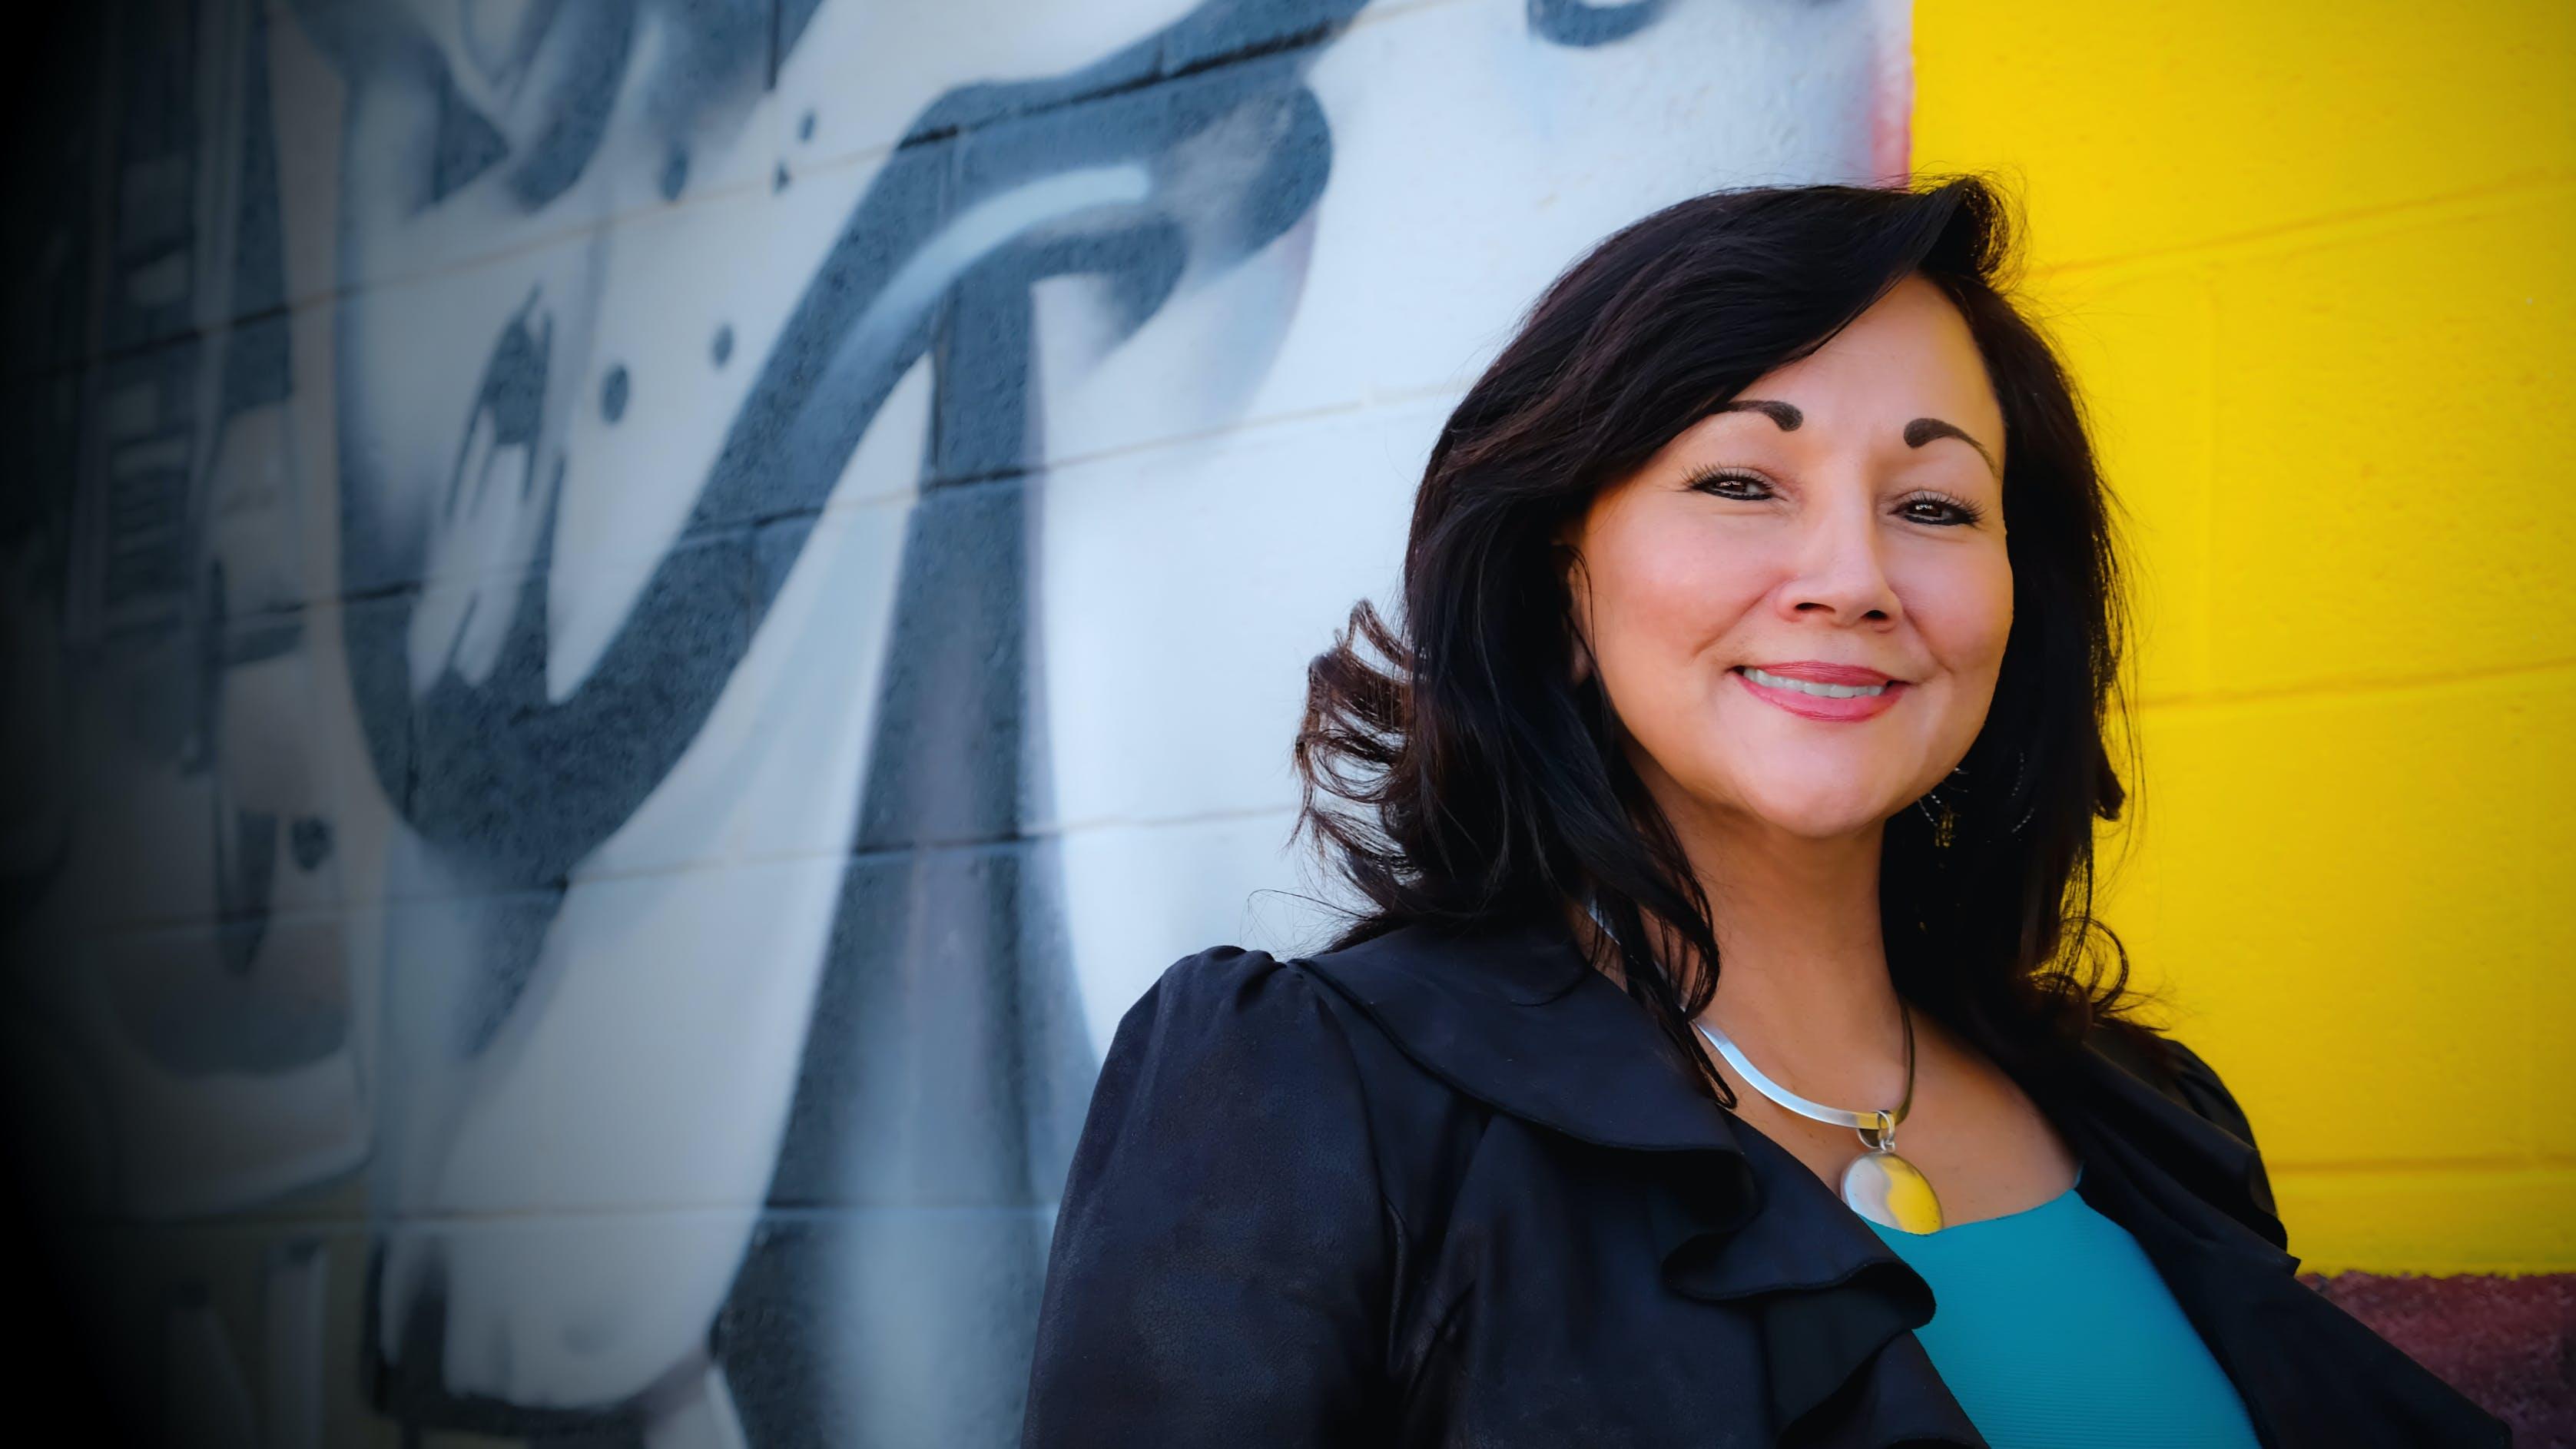 Norma Perea Biography Photo